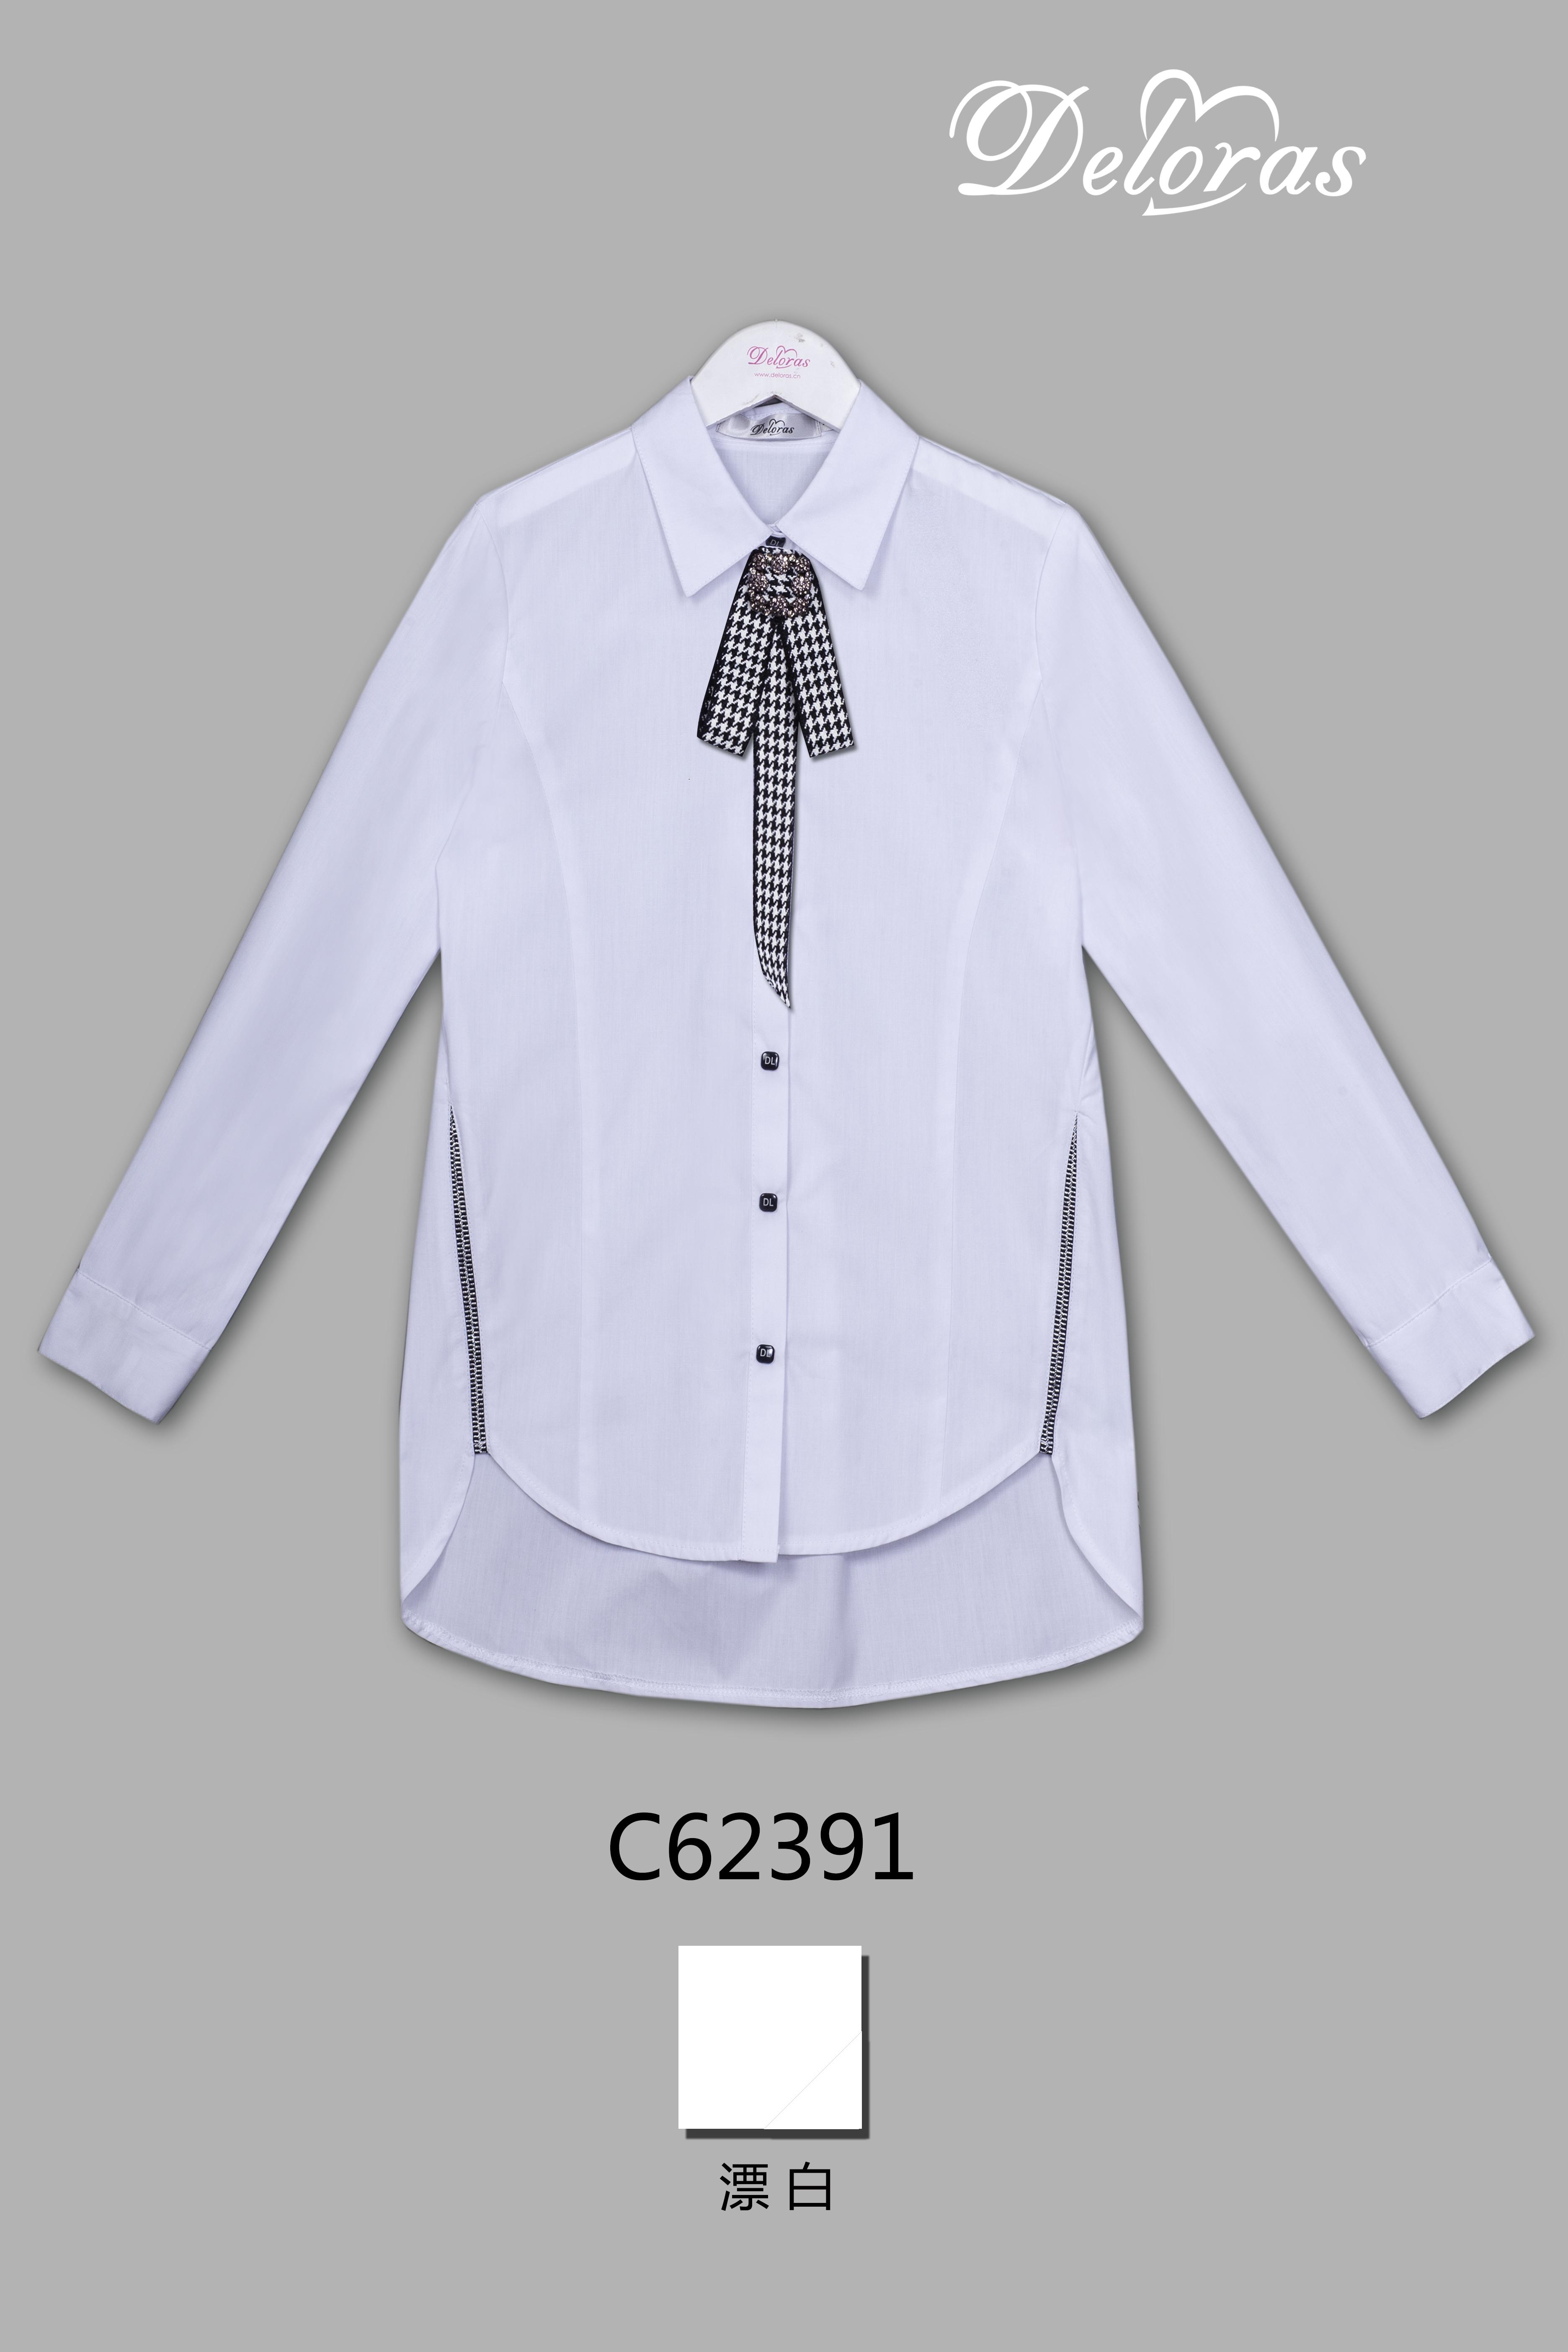 Блузка для девочки BHDL62391